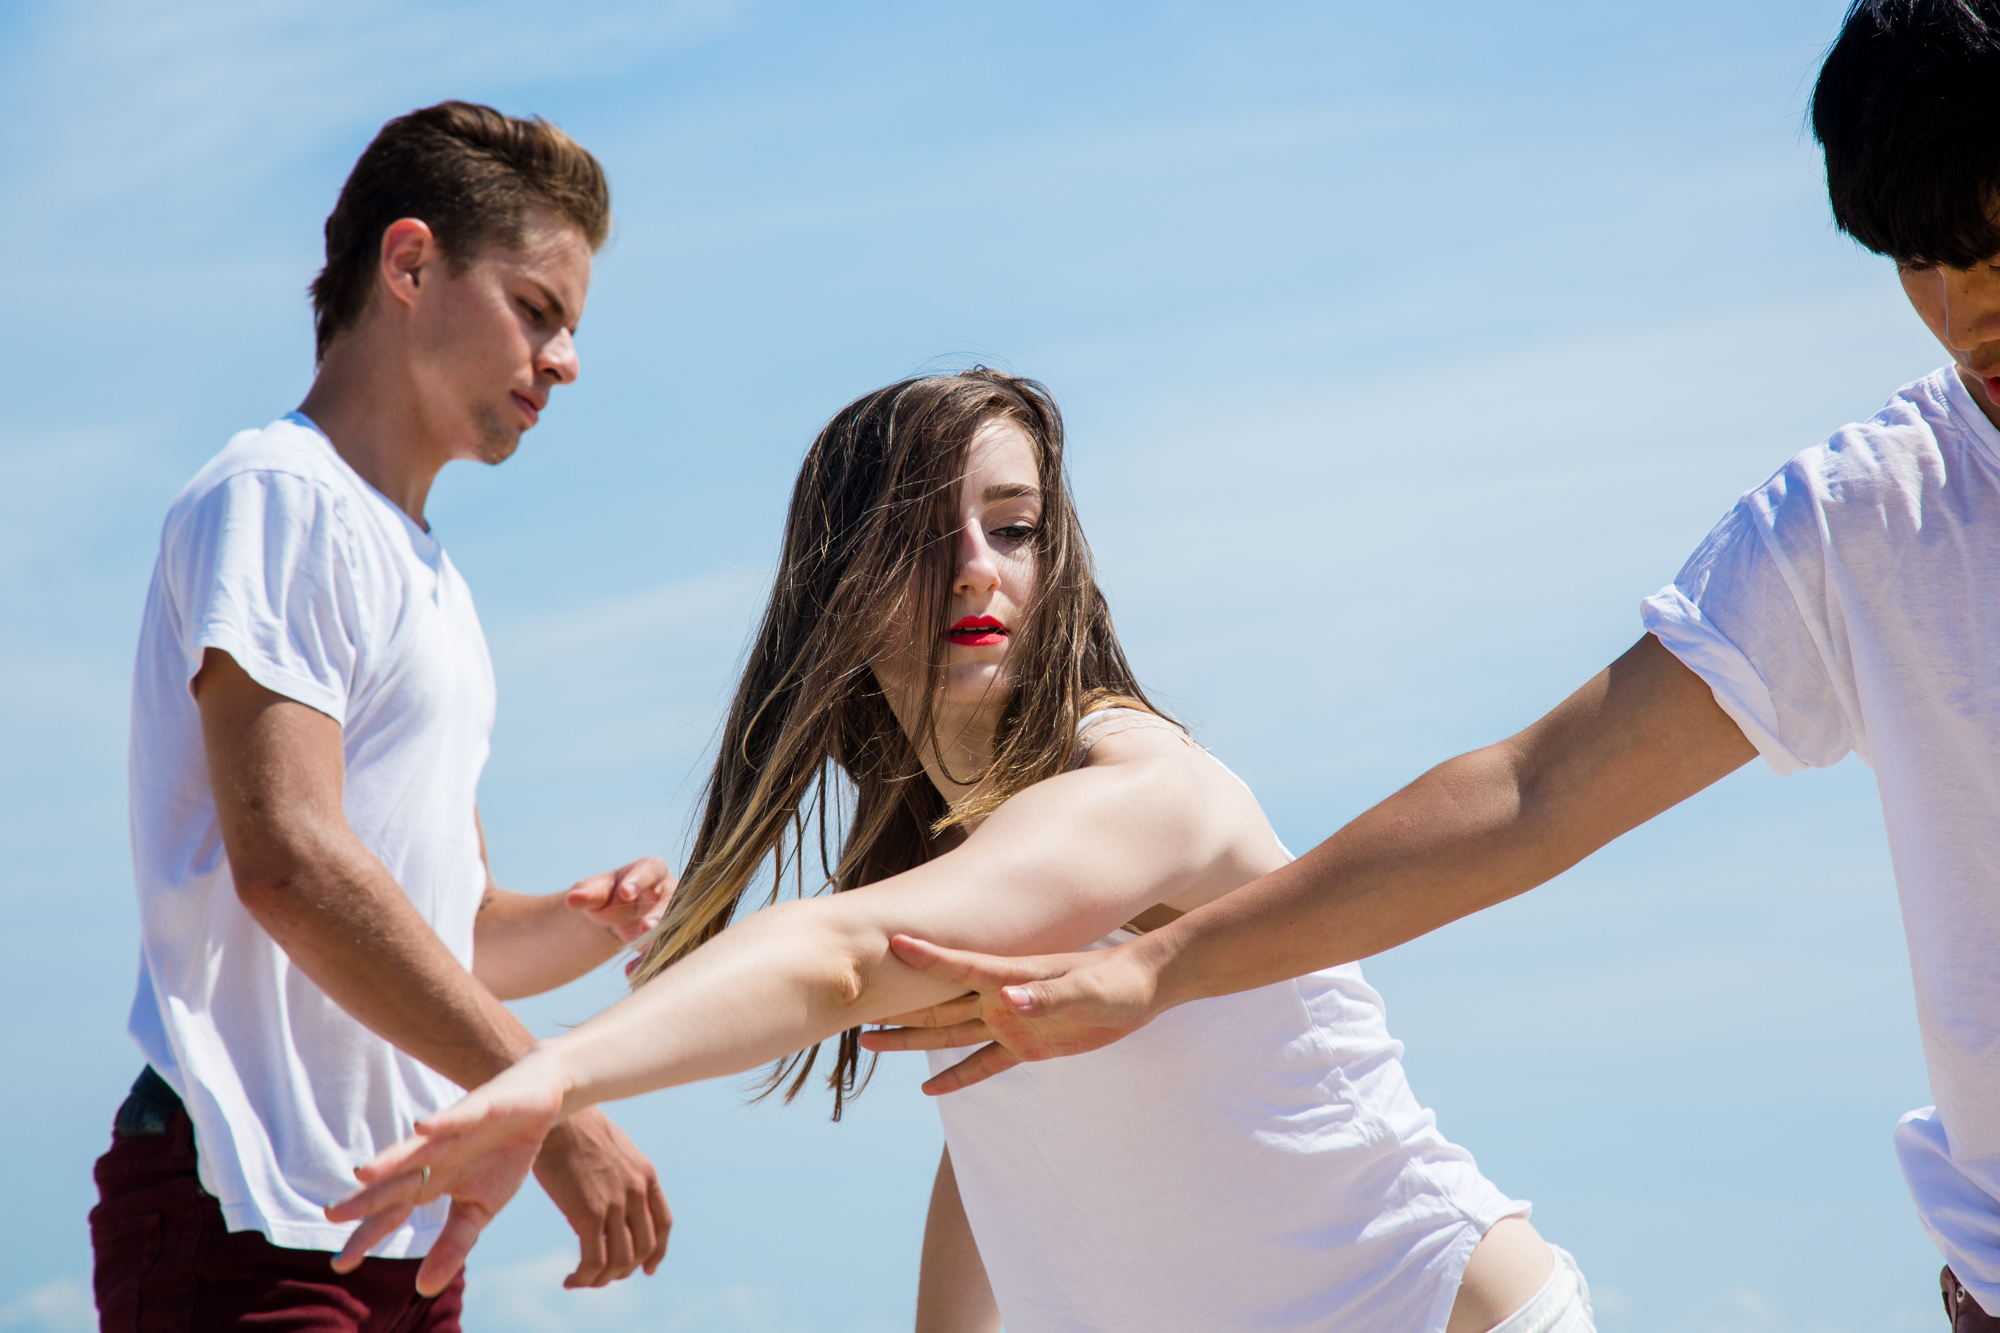 Rockaway Summer Dance Series_Photos by Daniel Terna_FIRST ROUGH SELECTS-19.jpg